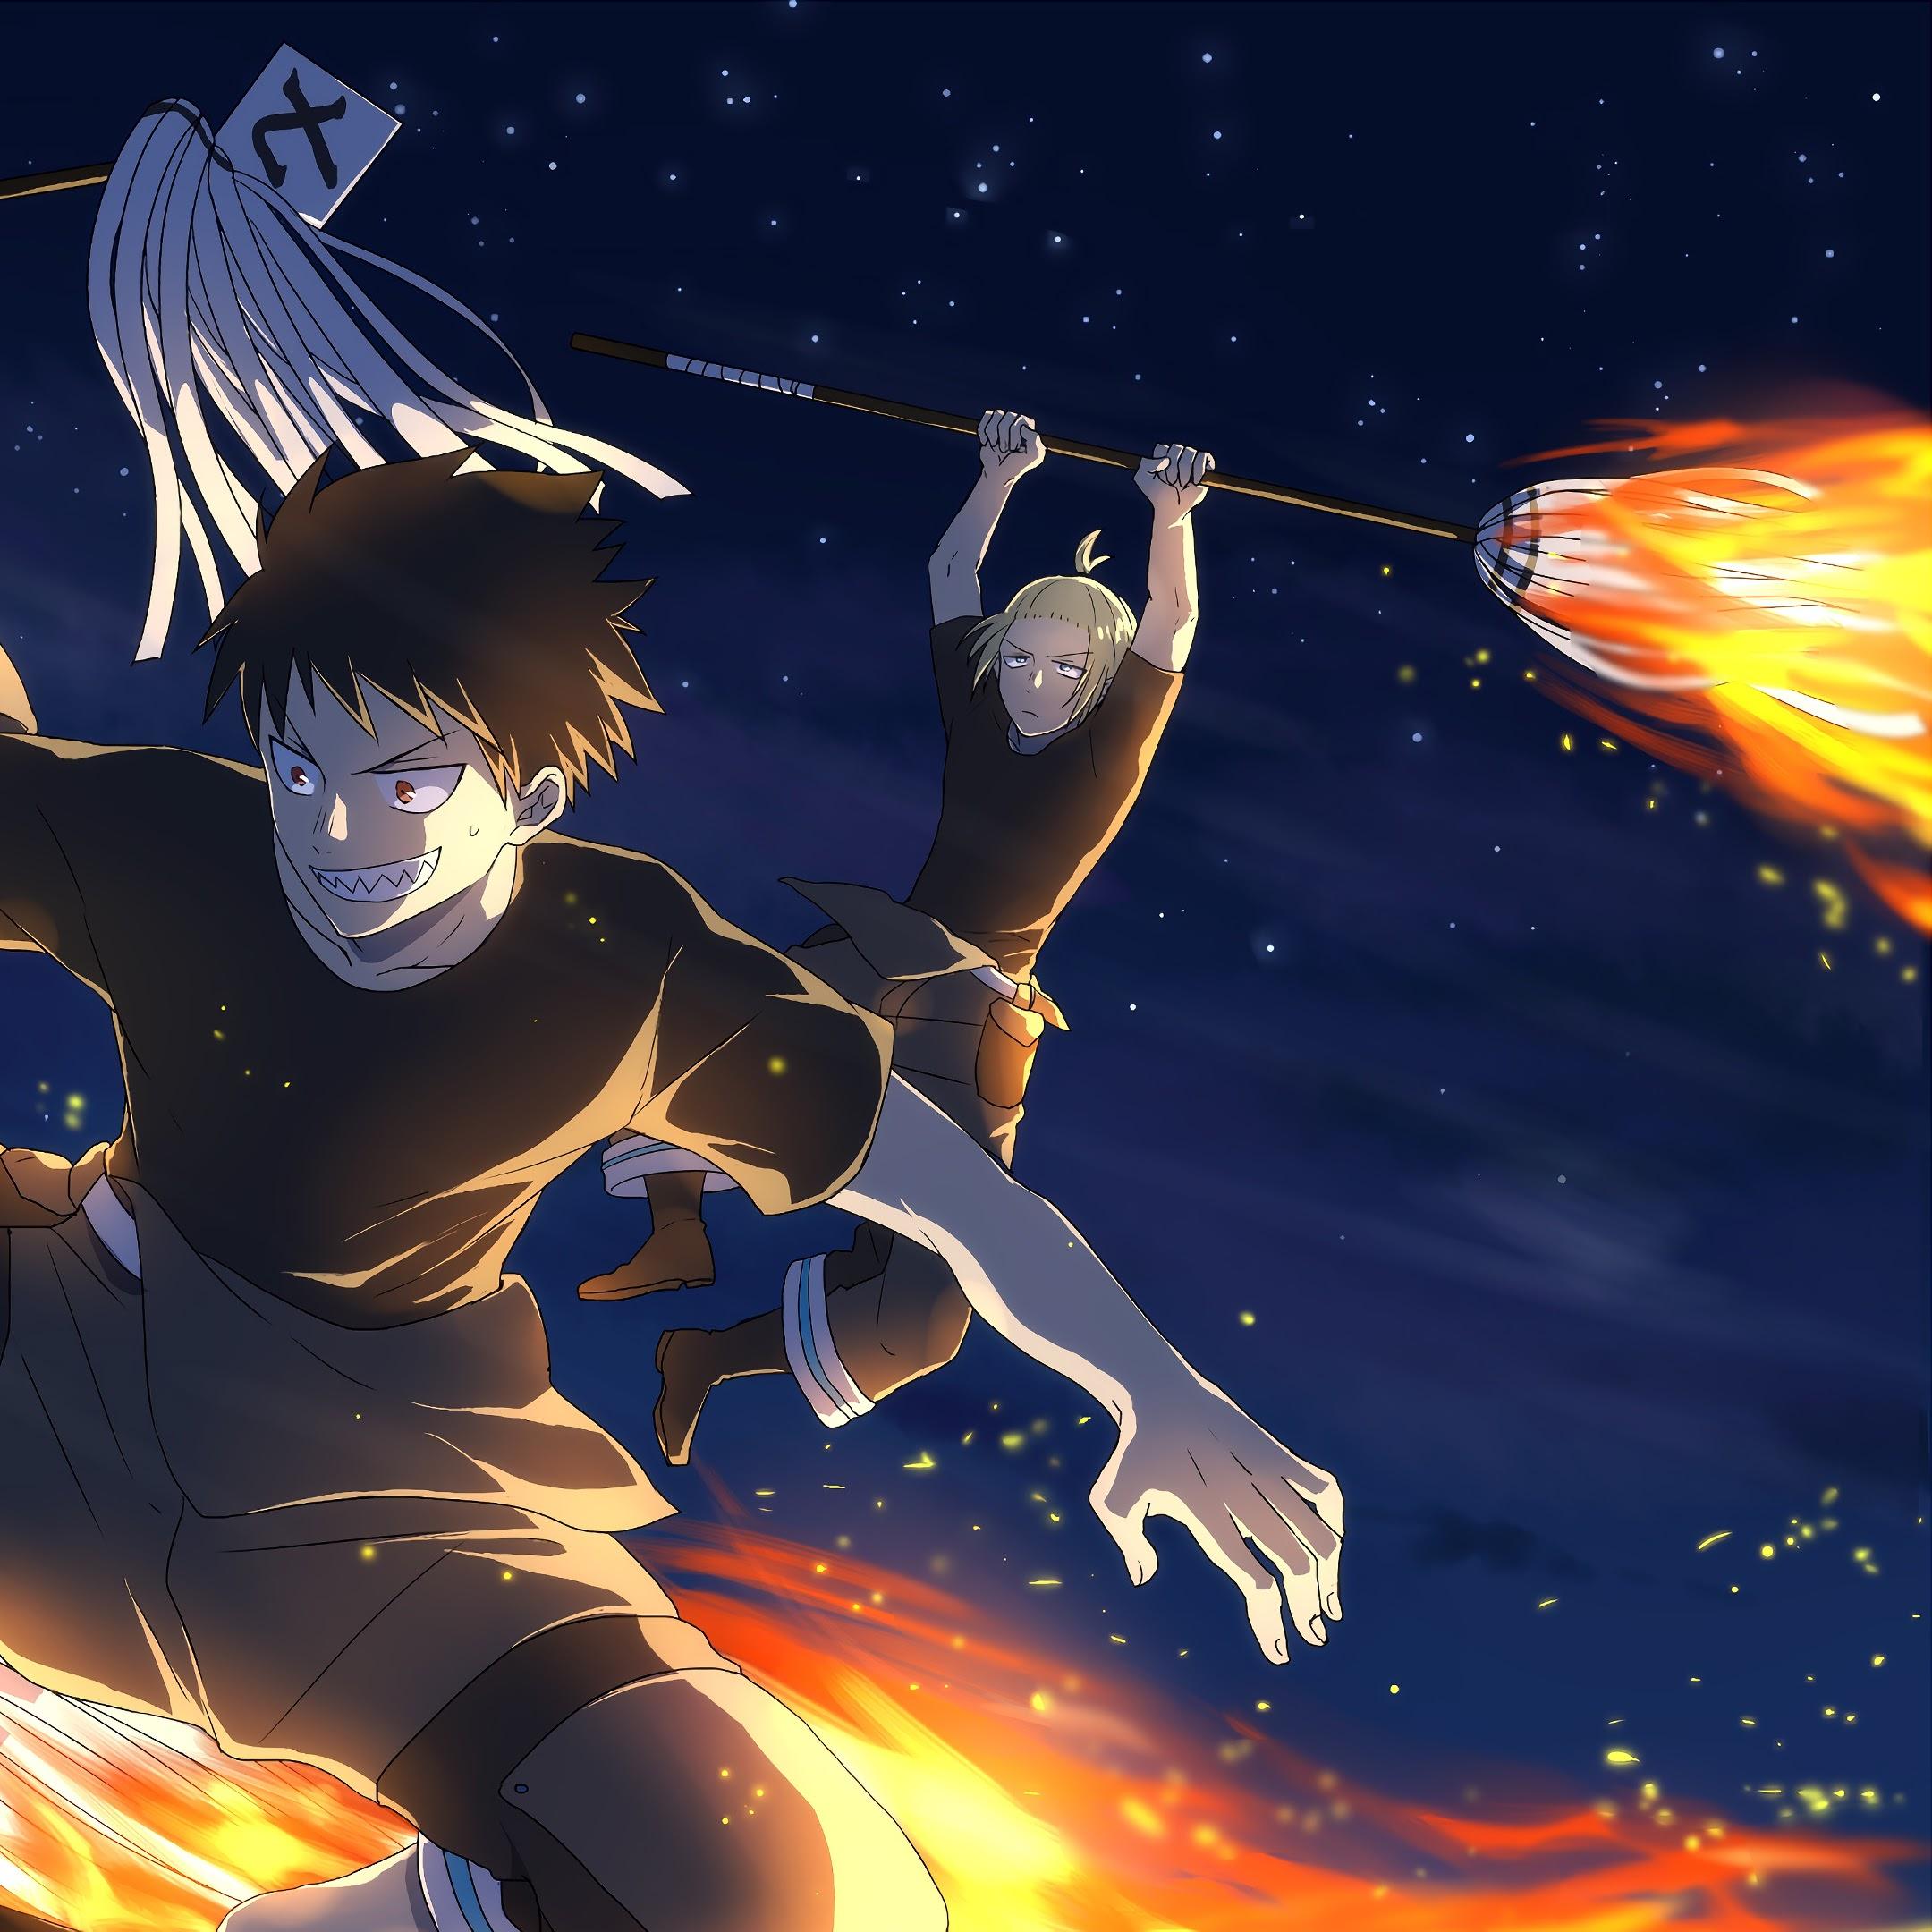 Fire Force Shinra Benimaru Arthur 4k 25 Wallpaper